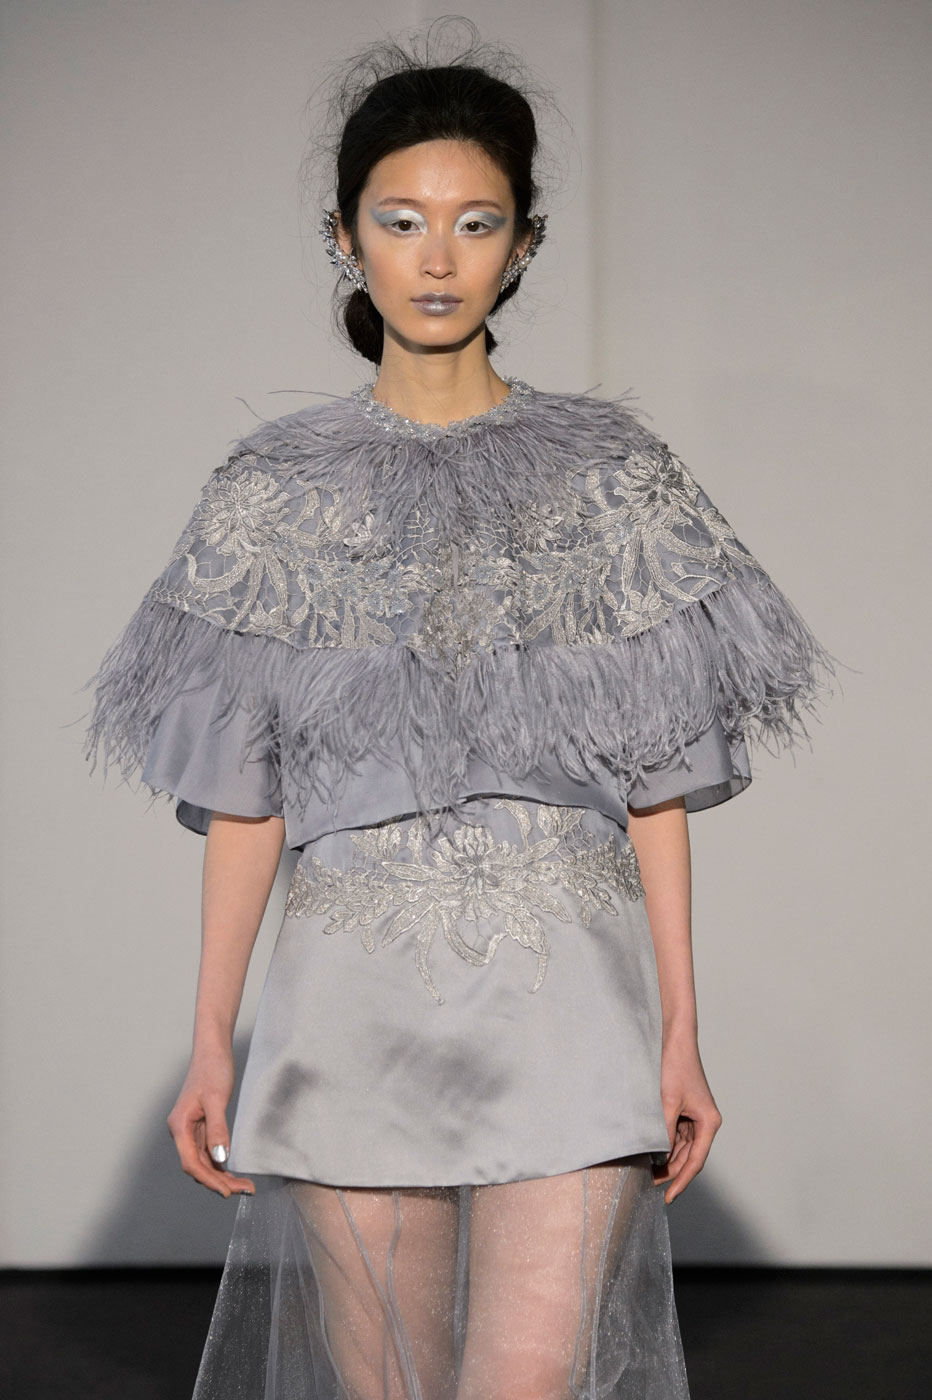 Busardi-fashion-runway-show-haute-couture-paris-spring-2015-the-impression-65